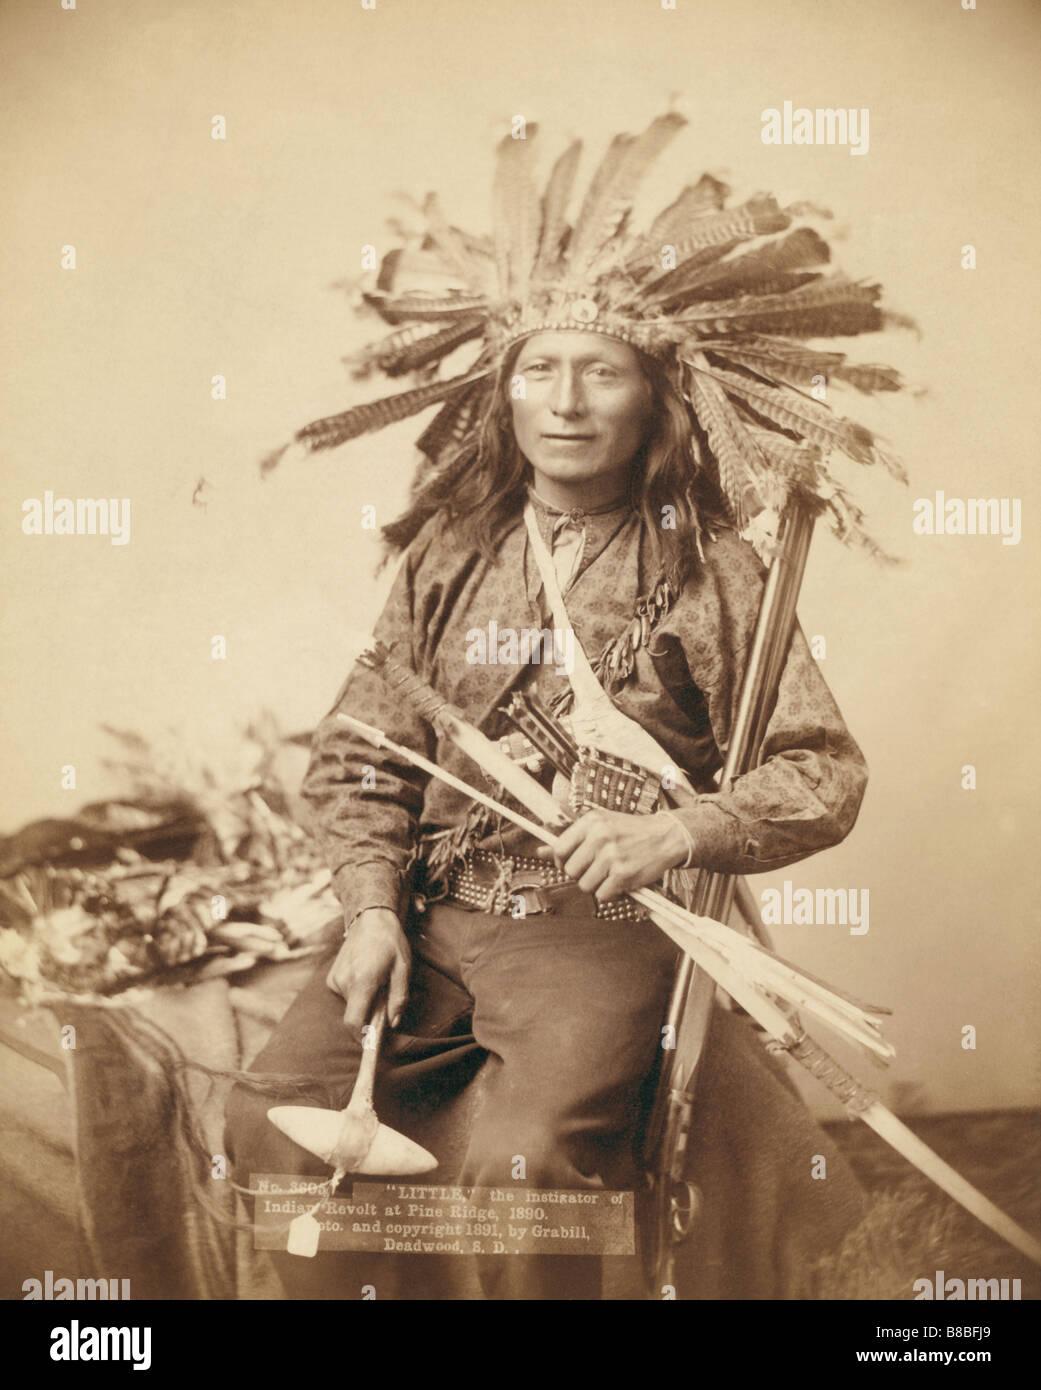 Little, the instigator of Indian Revolt at Pine Ridge, 1890 - Stock Image